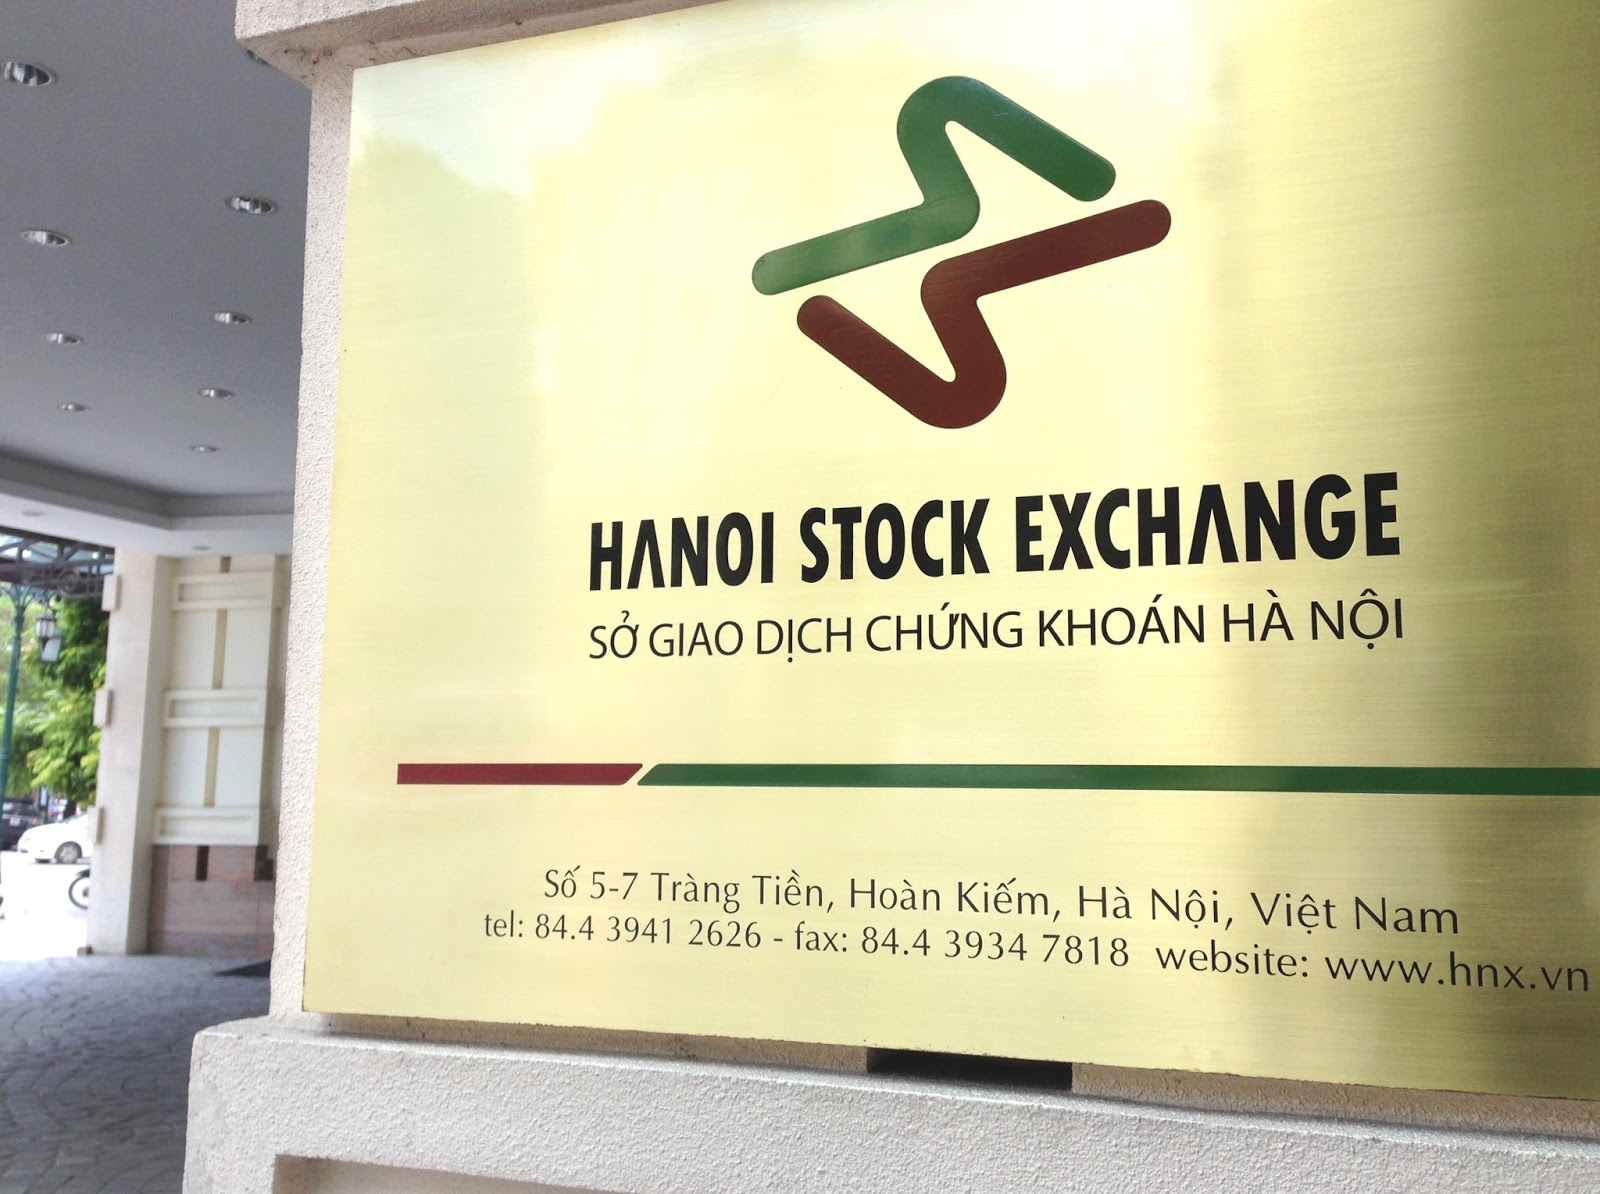 hanoi-stock-exchange ハノイ証券取引所